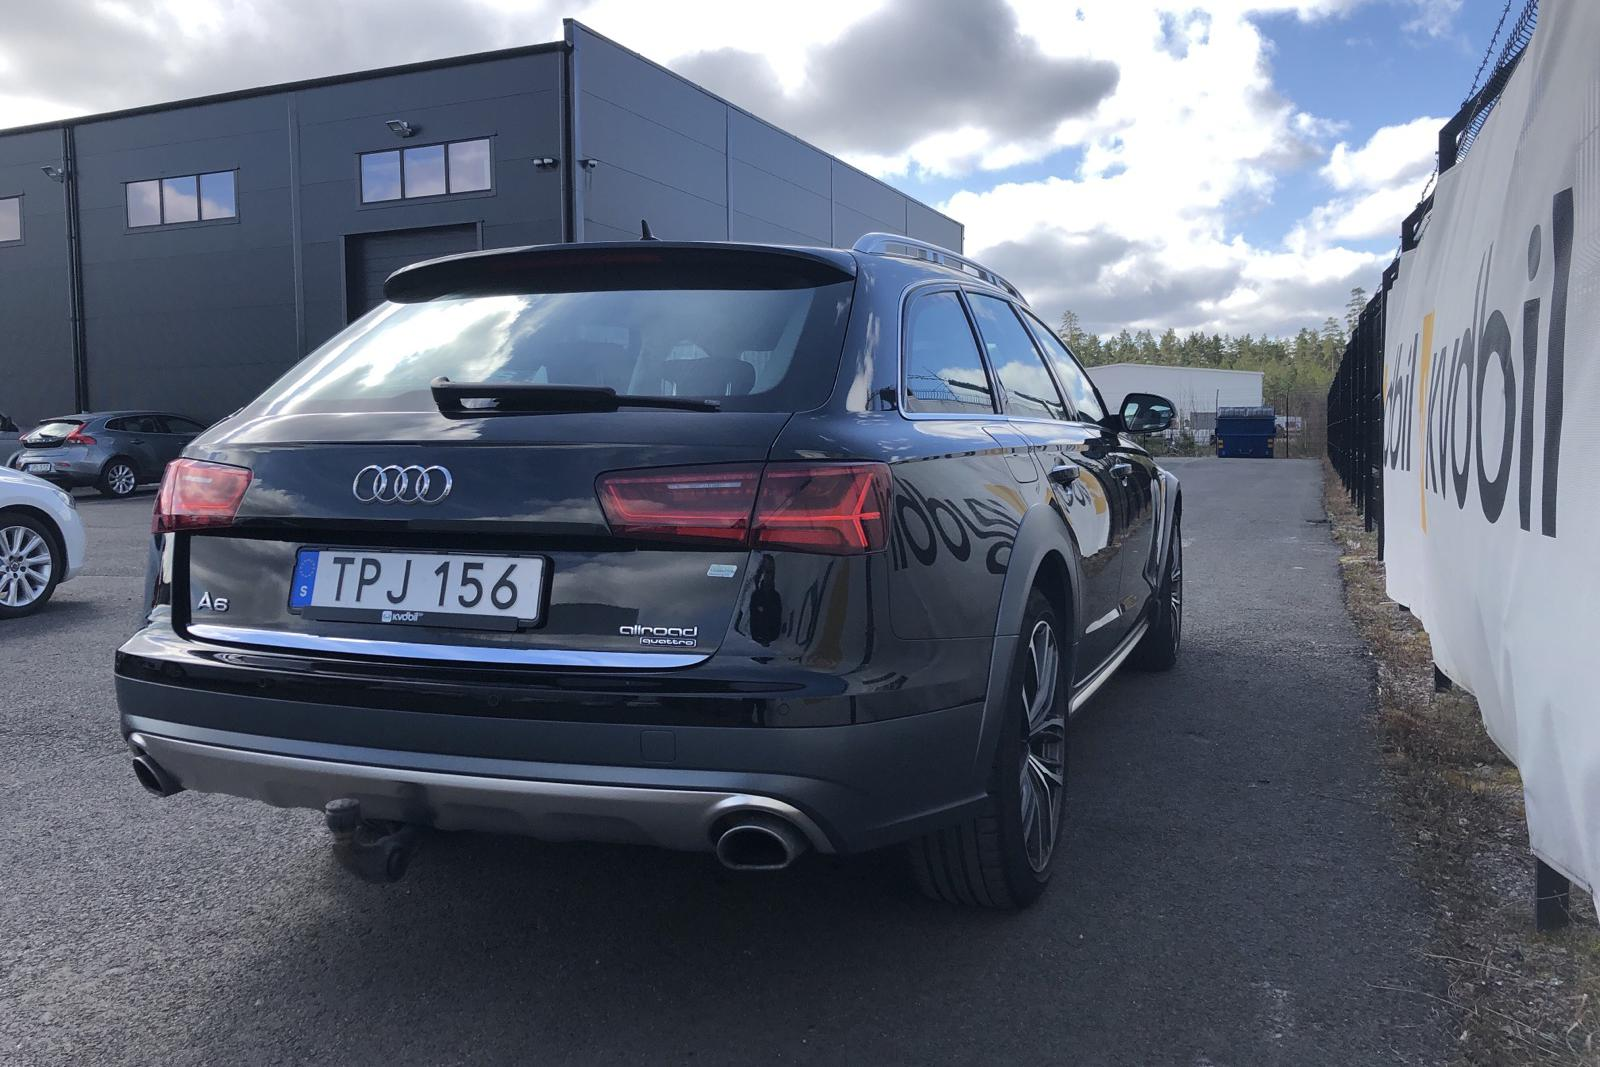 Audi A6 Allroad 3.0 TDI quattro (218hk) - 178 590 km - Automatic - black - 2015